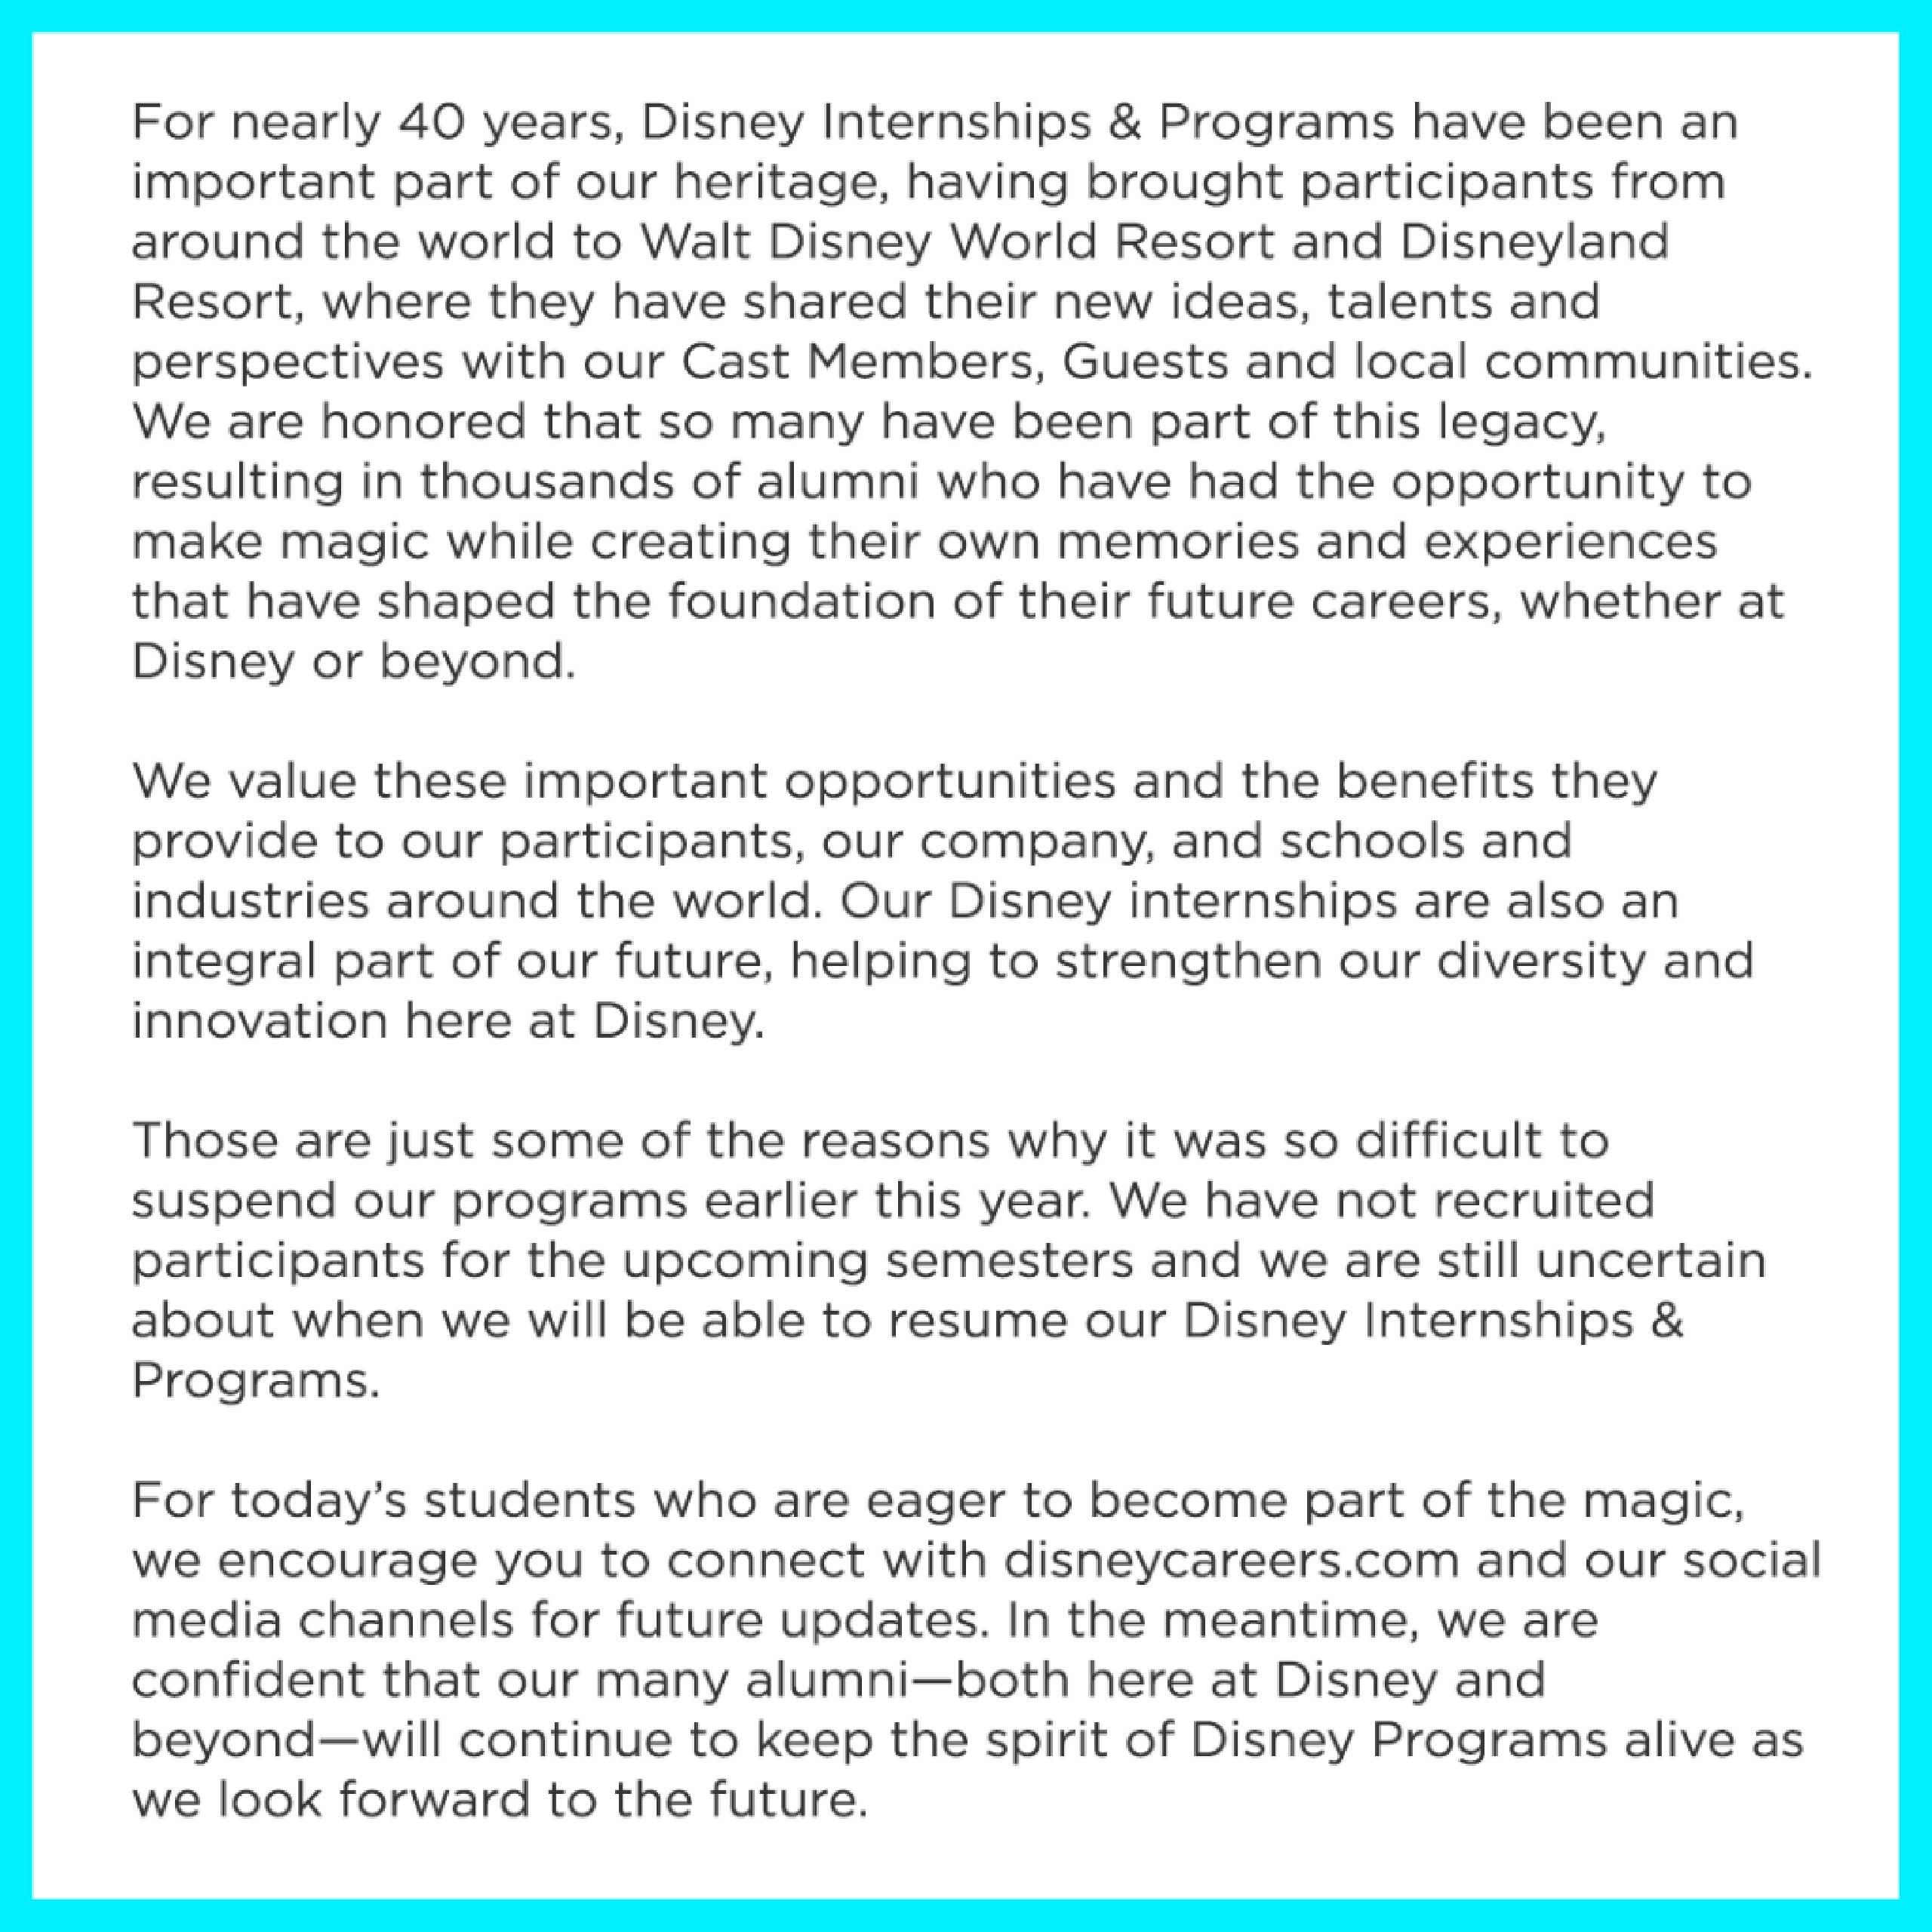 Disney Internships and Programs updates - December 2020